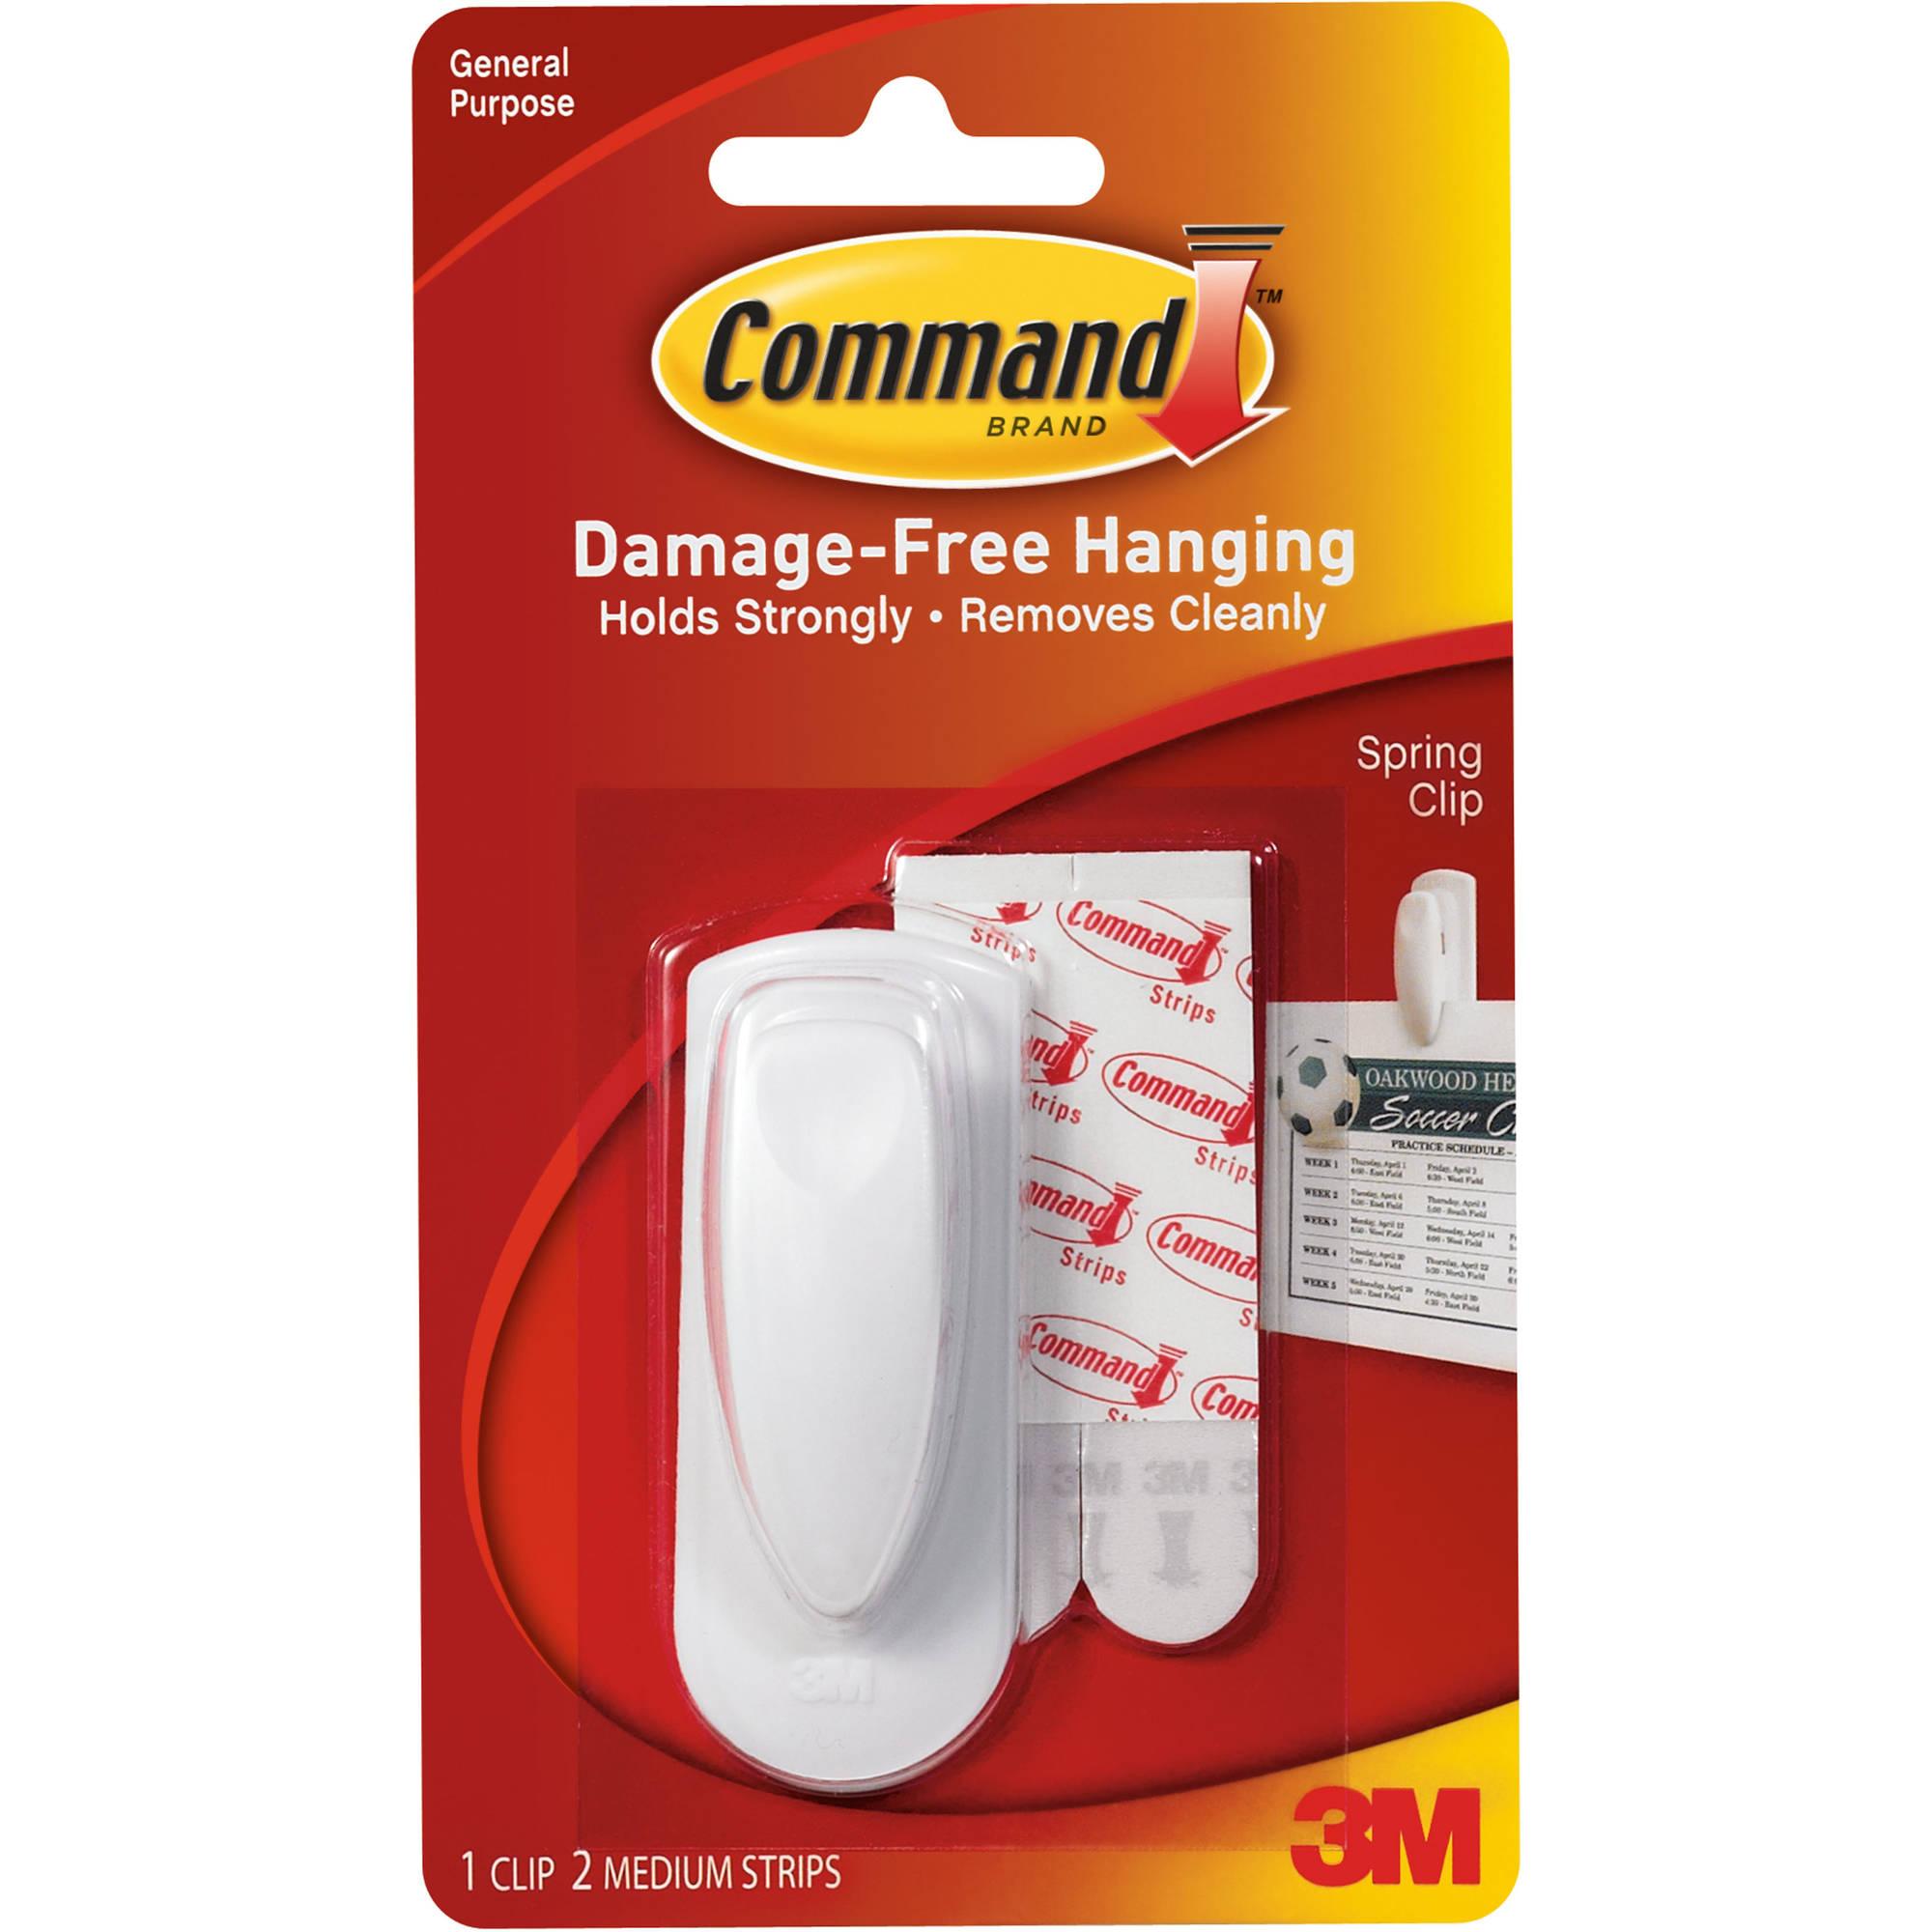 Command Spring Clip, White, 1 Clip, 2 Strips, 17005